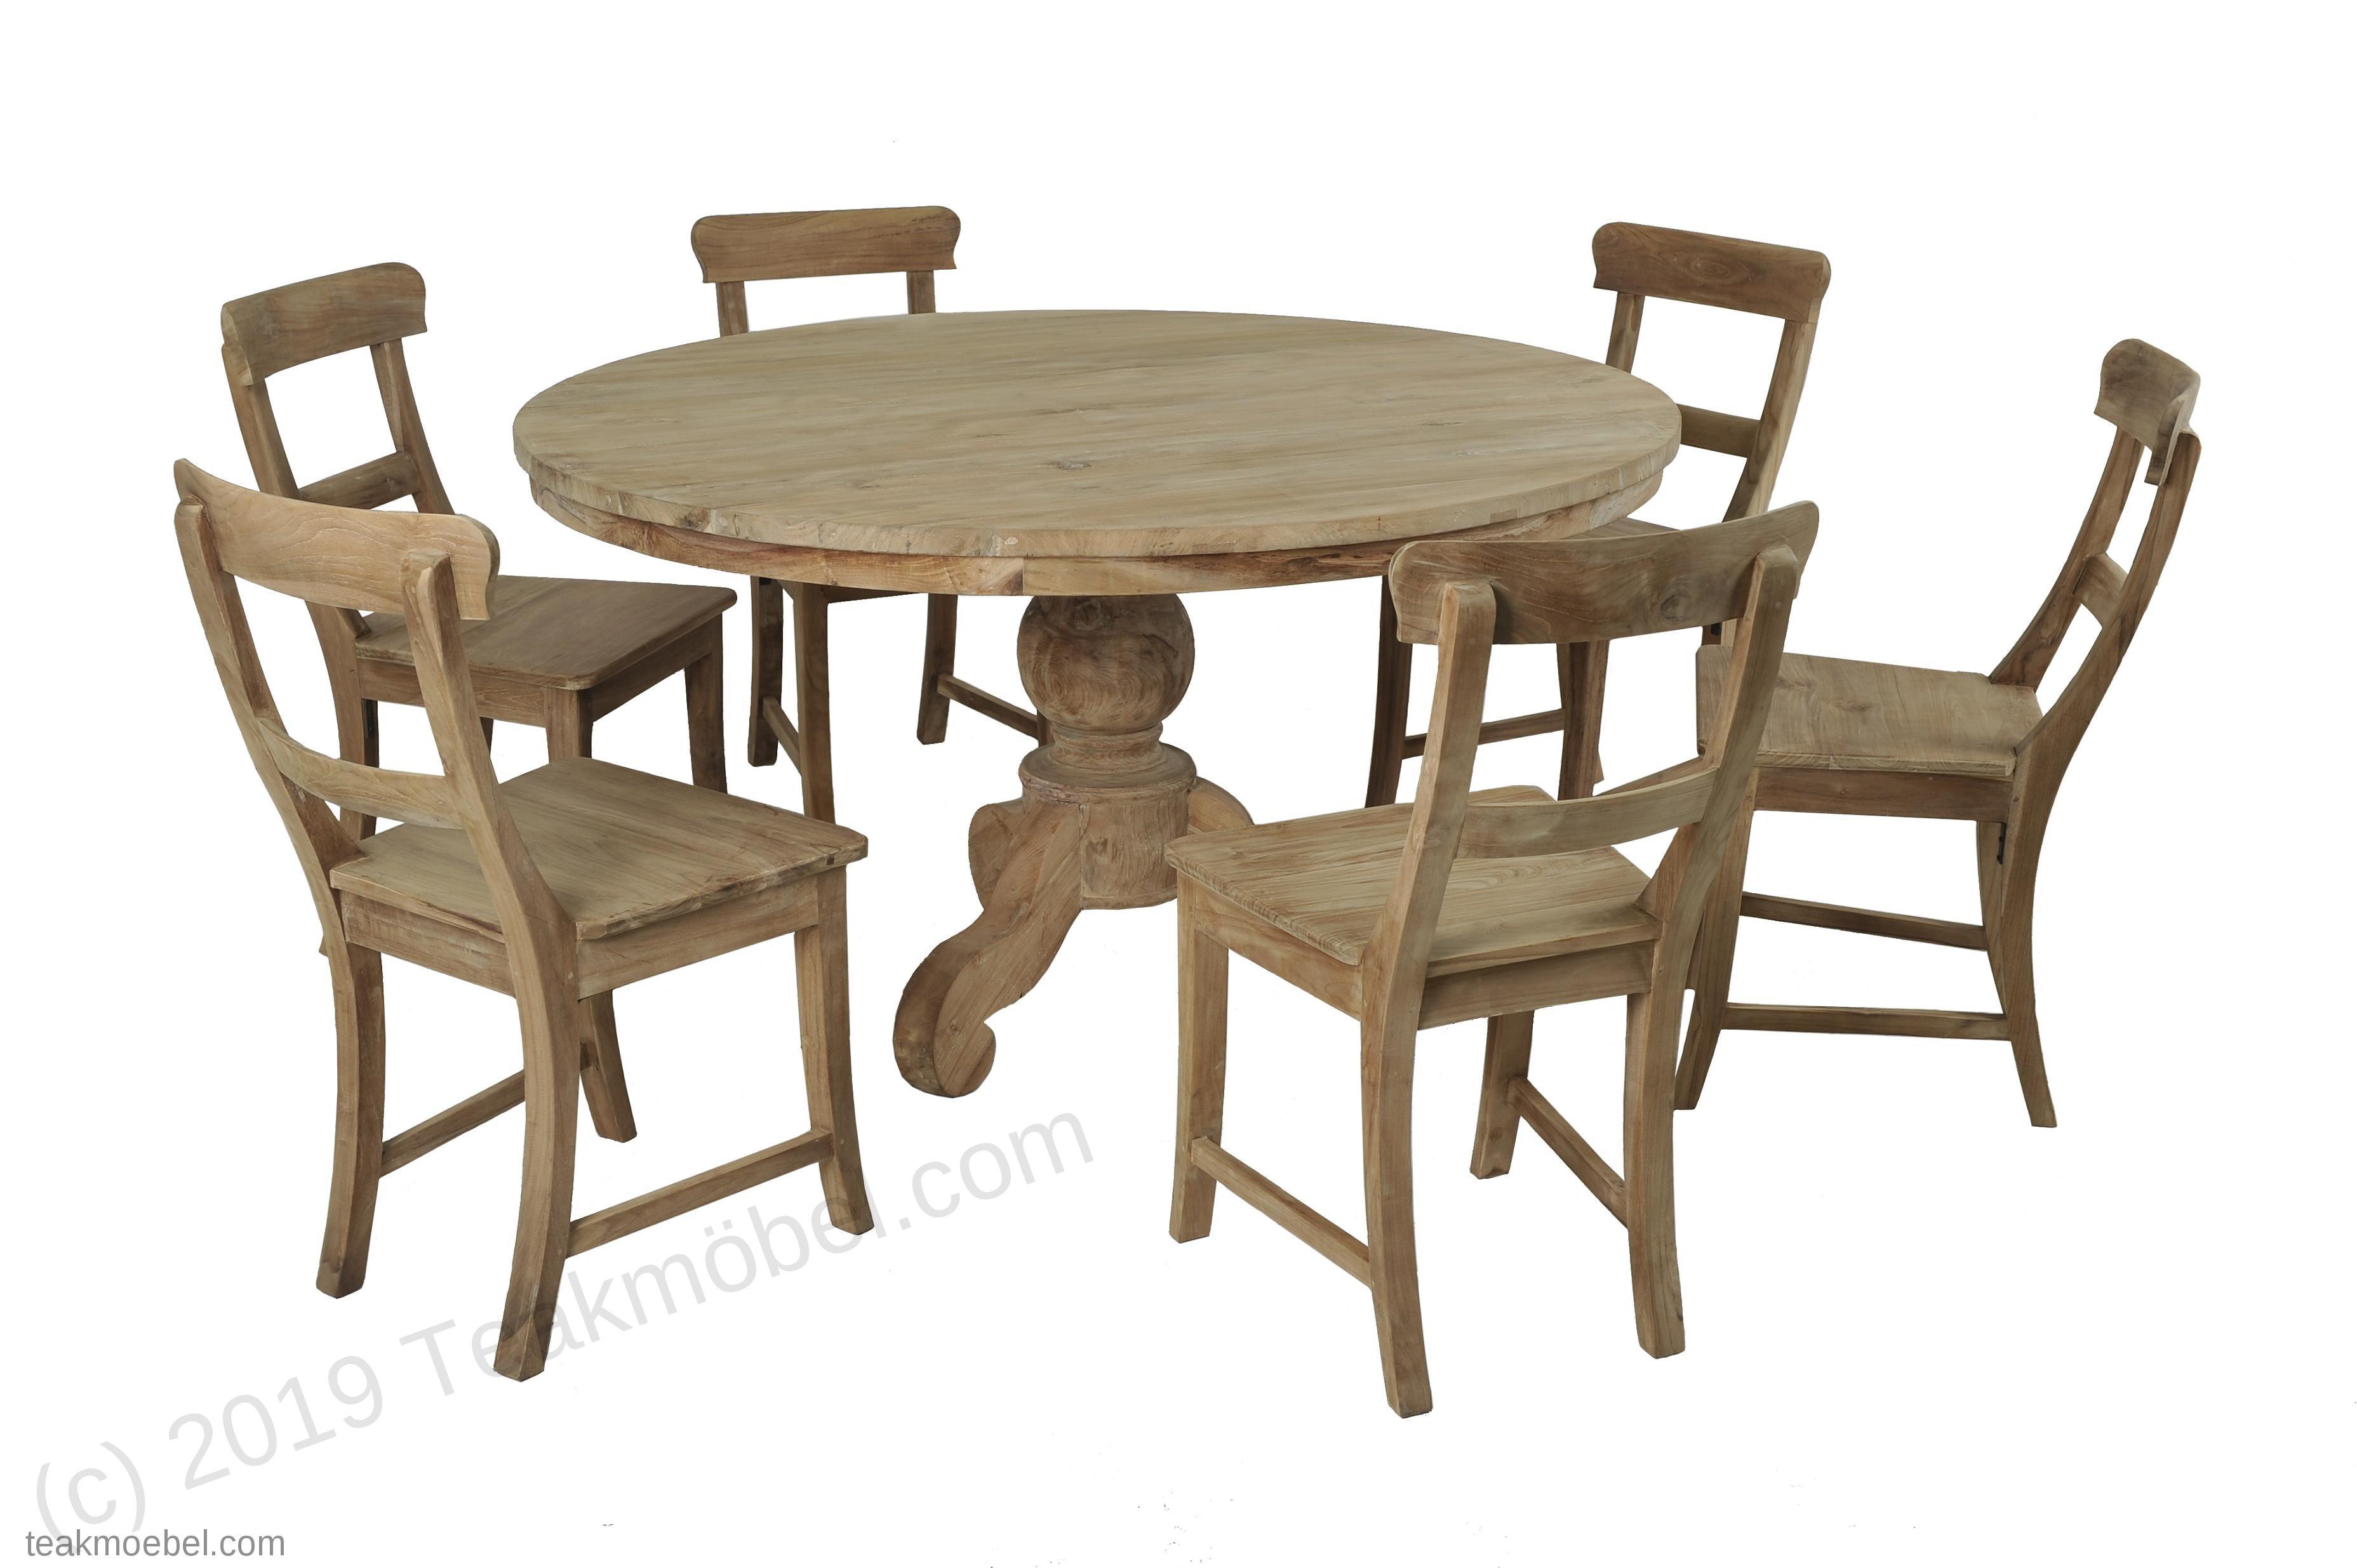 Teak Tisch Rund 140 6 Stuhle Teakmobel Com